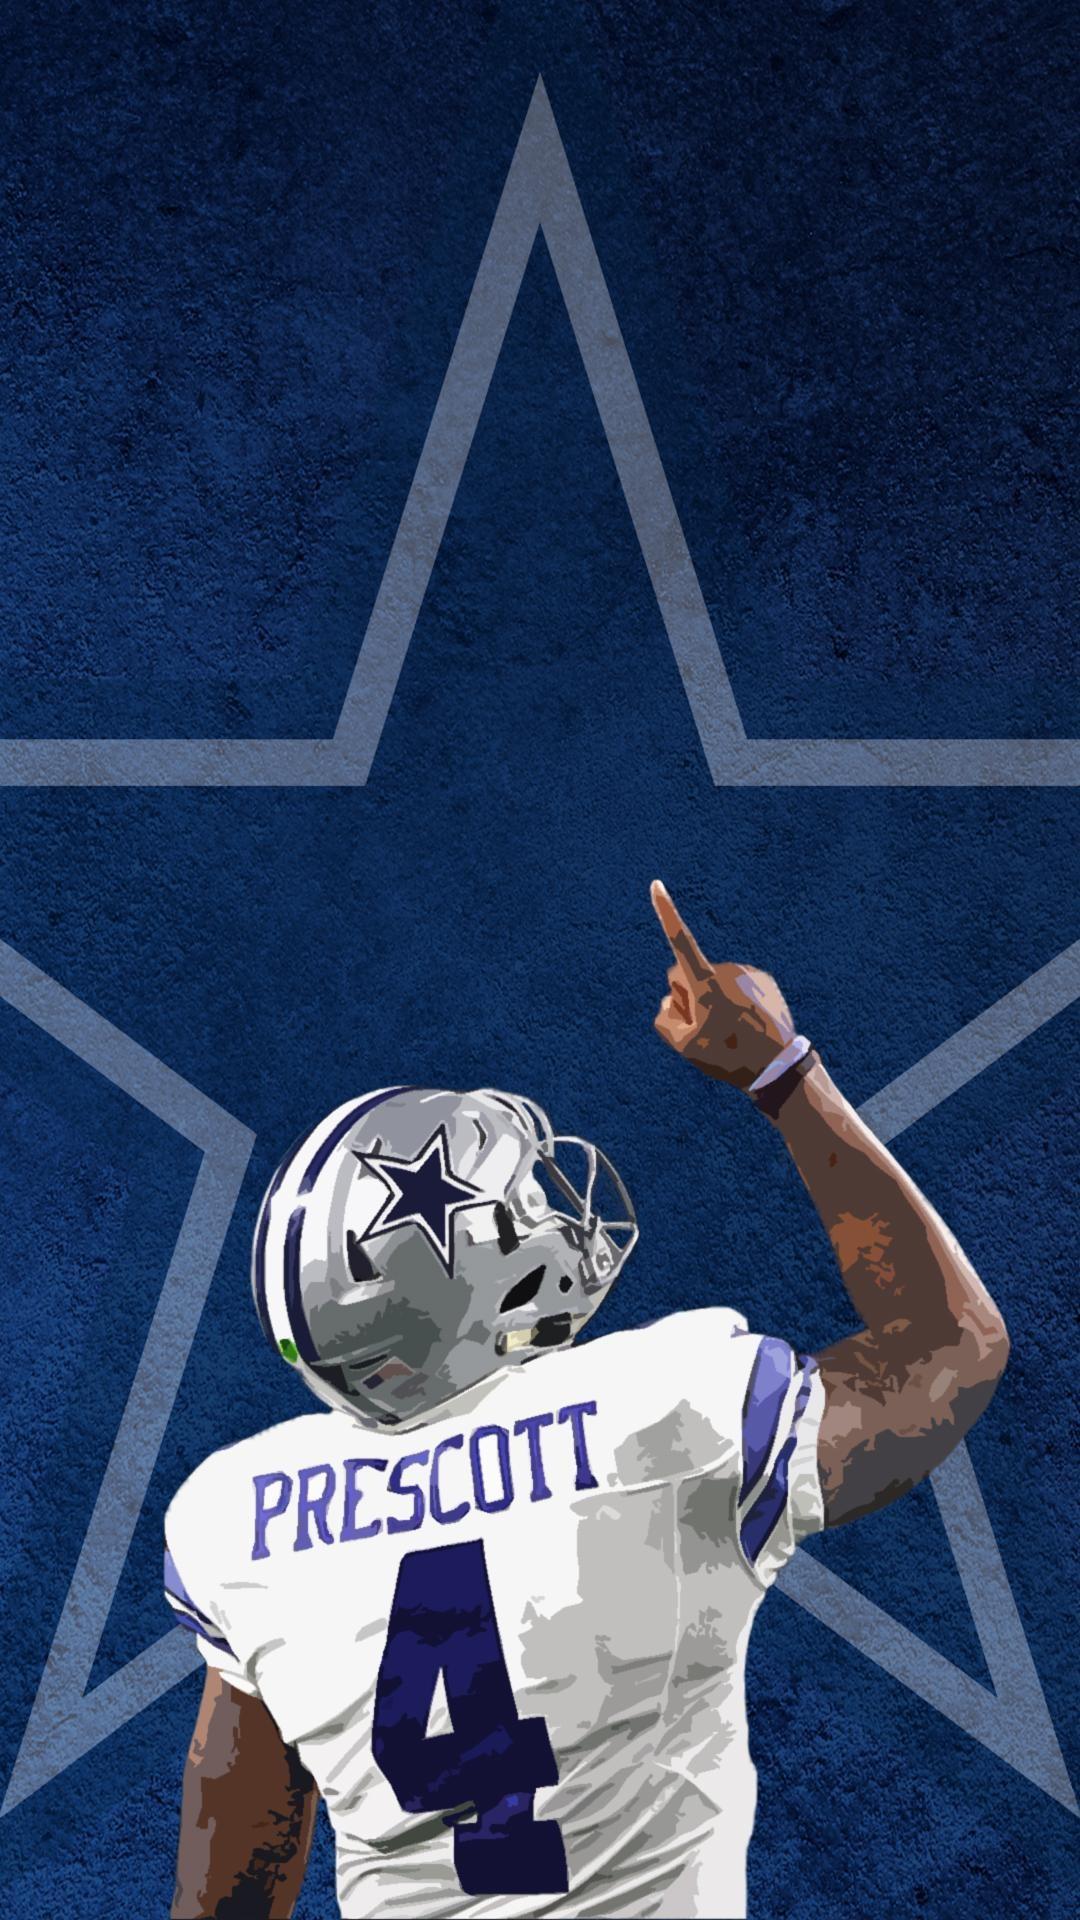 Dallas Cowboys Live Wallpaper Iphone Dallas Cowboys Christmas Wallpaper 56 Images